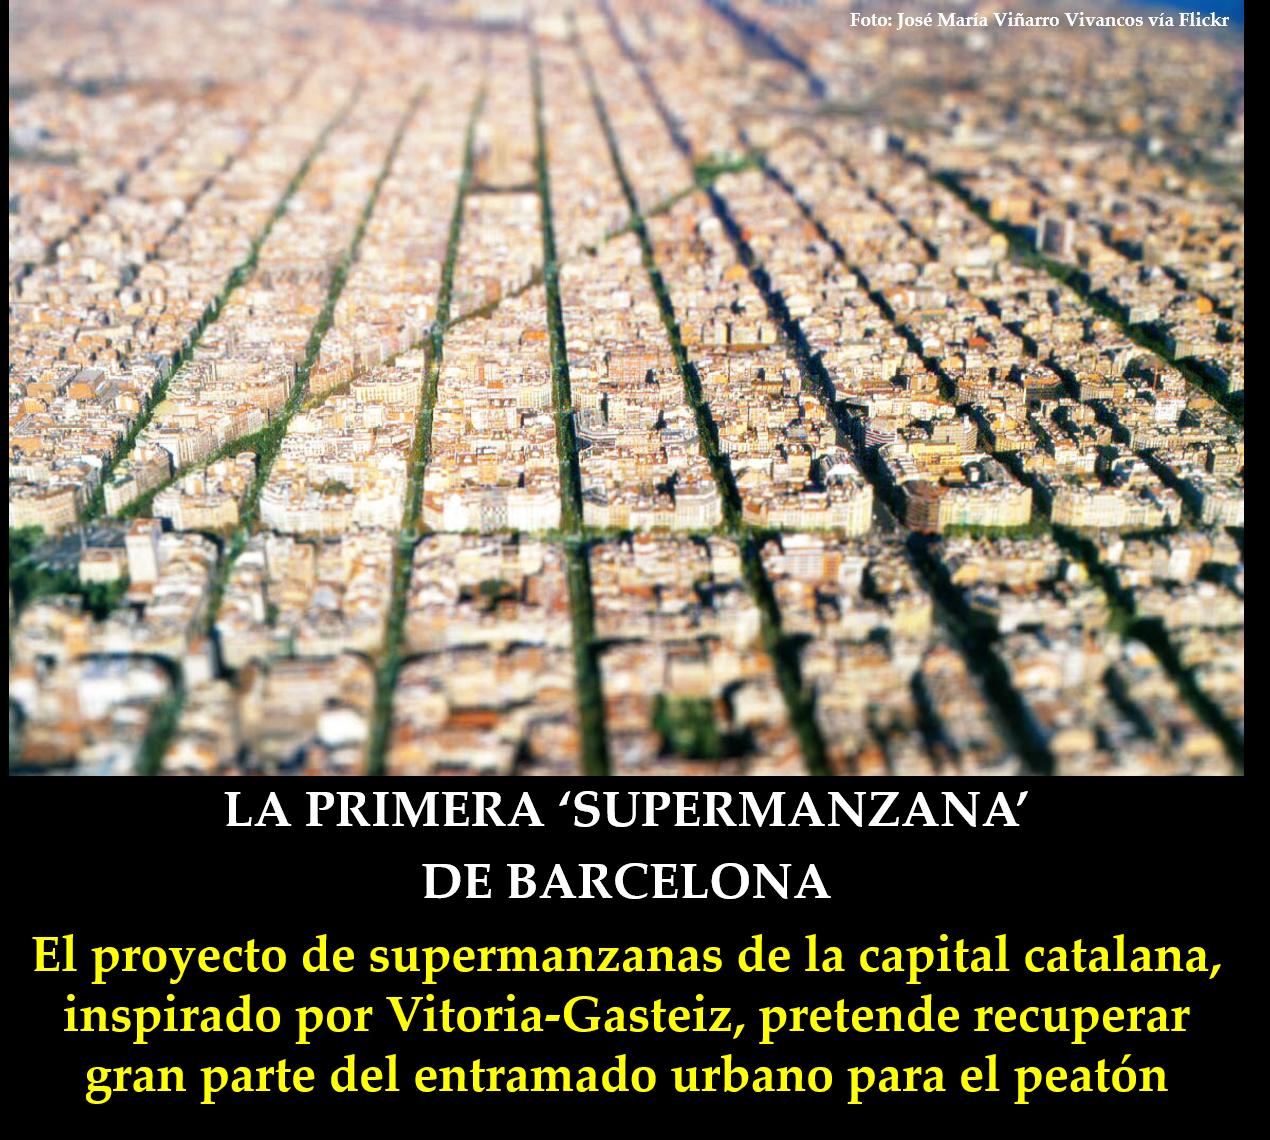 La primera supermanzana de barcelona infopost